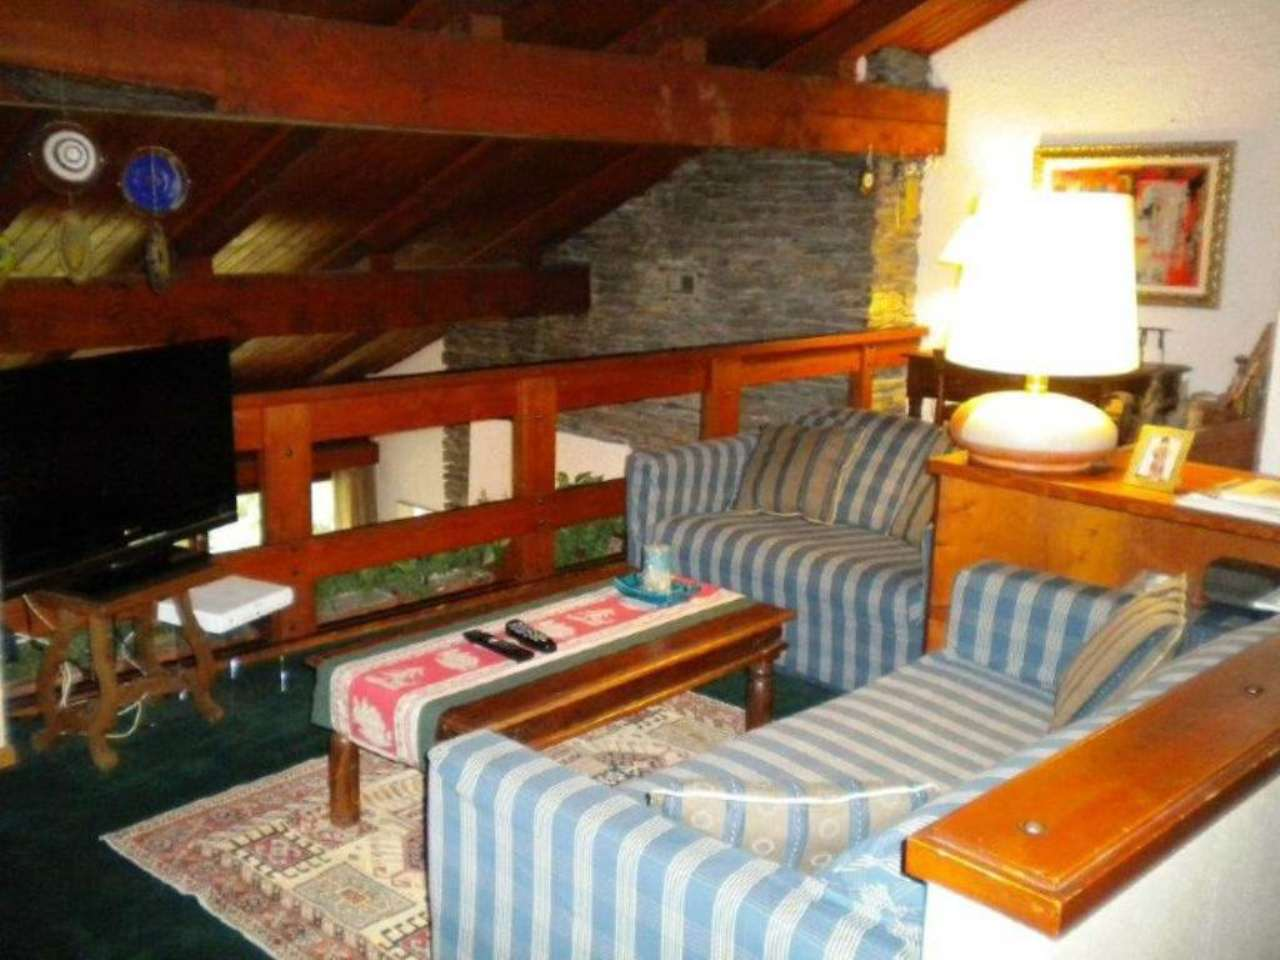 Villa in Vendita a Courmayeur: 5 locali, 220 mq - Foto 9